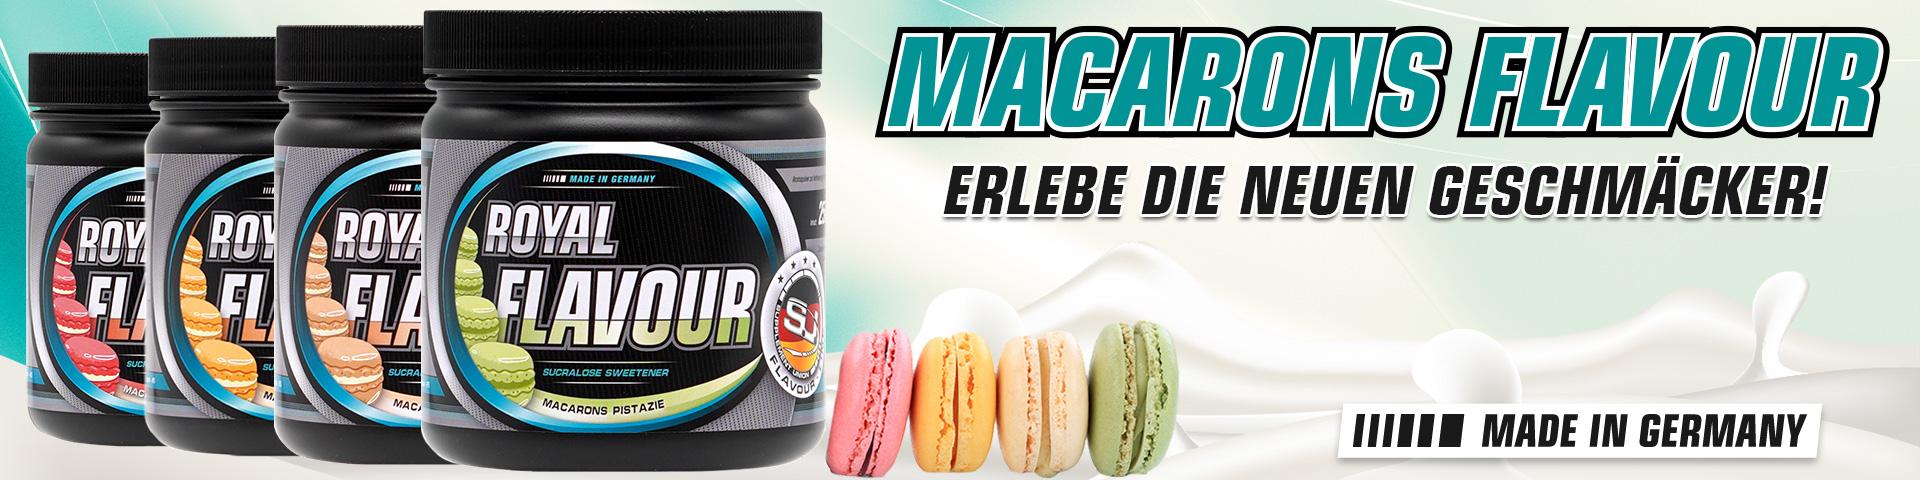 macarons-flavour-alle-sorten.jpg